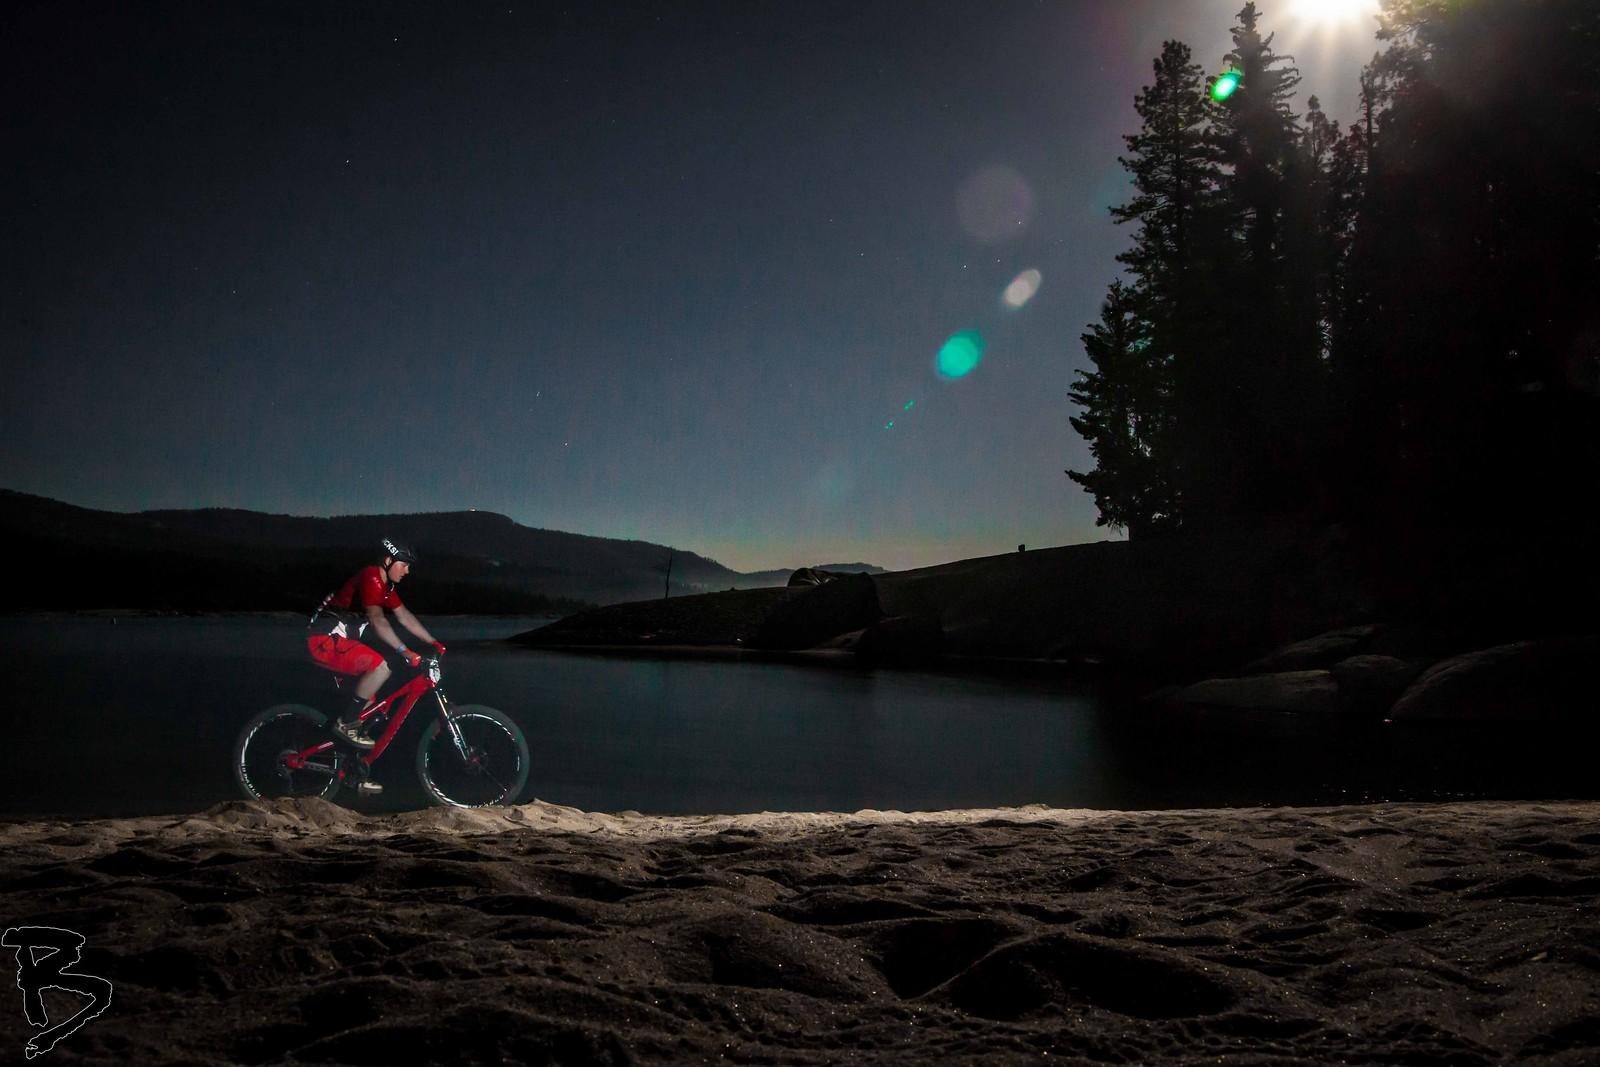 The Night Ghost - GnarHuck - Mountain Biking Pictures - Vital MTB